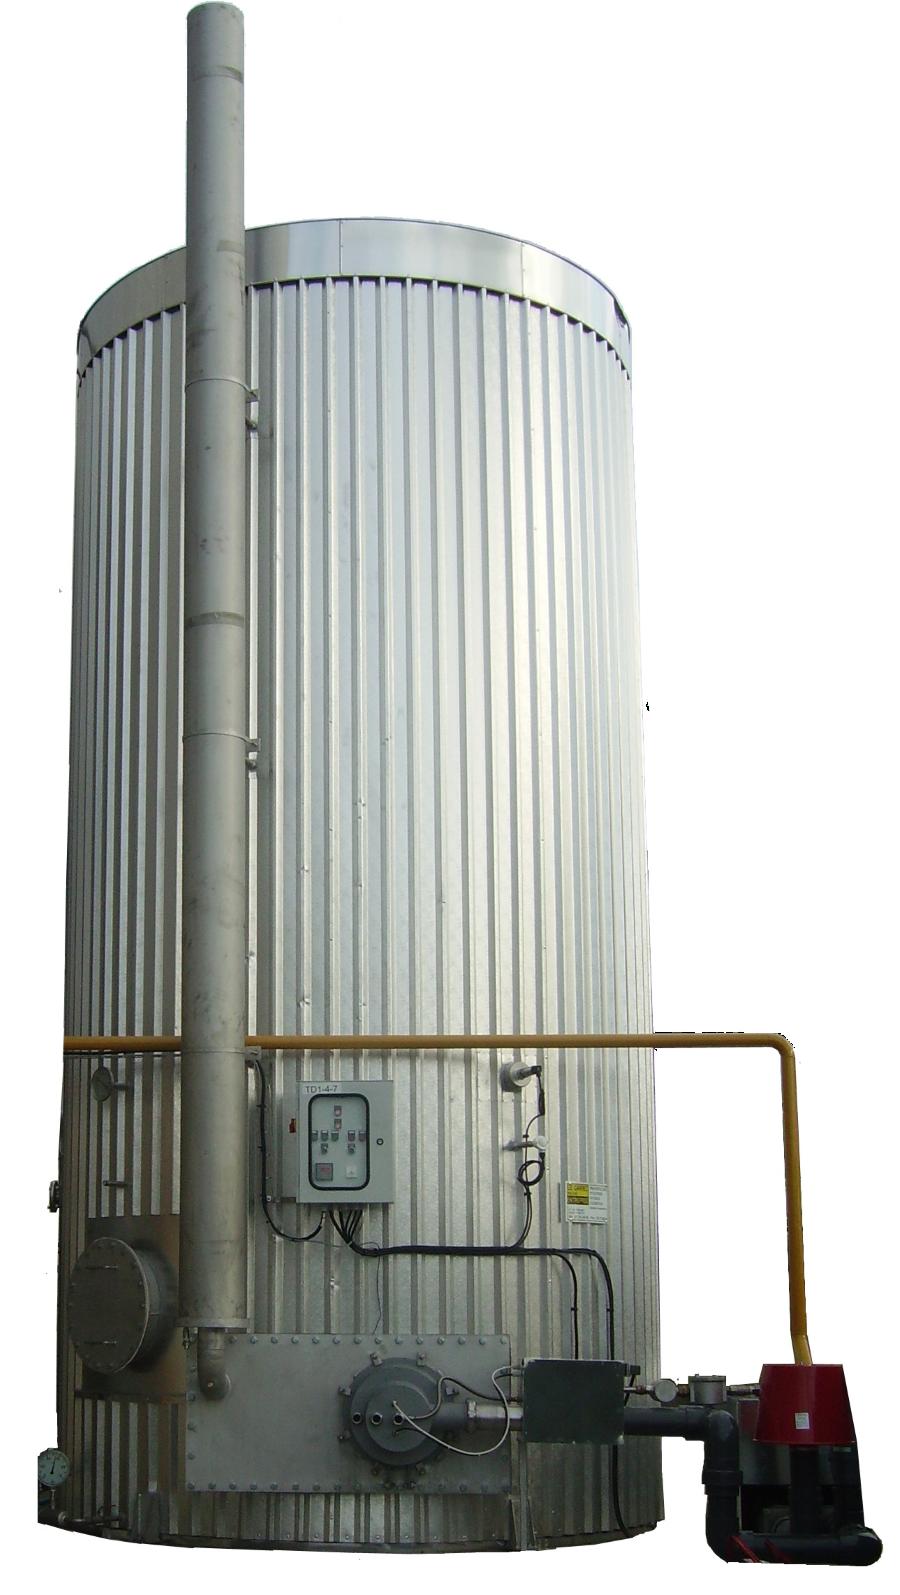 Encon Biogasbrander met ketel